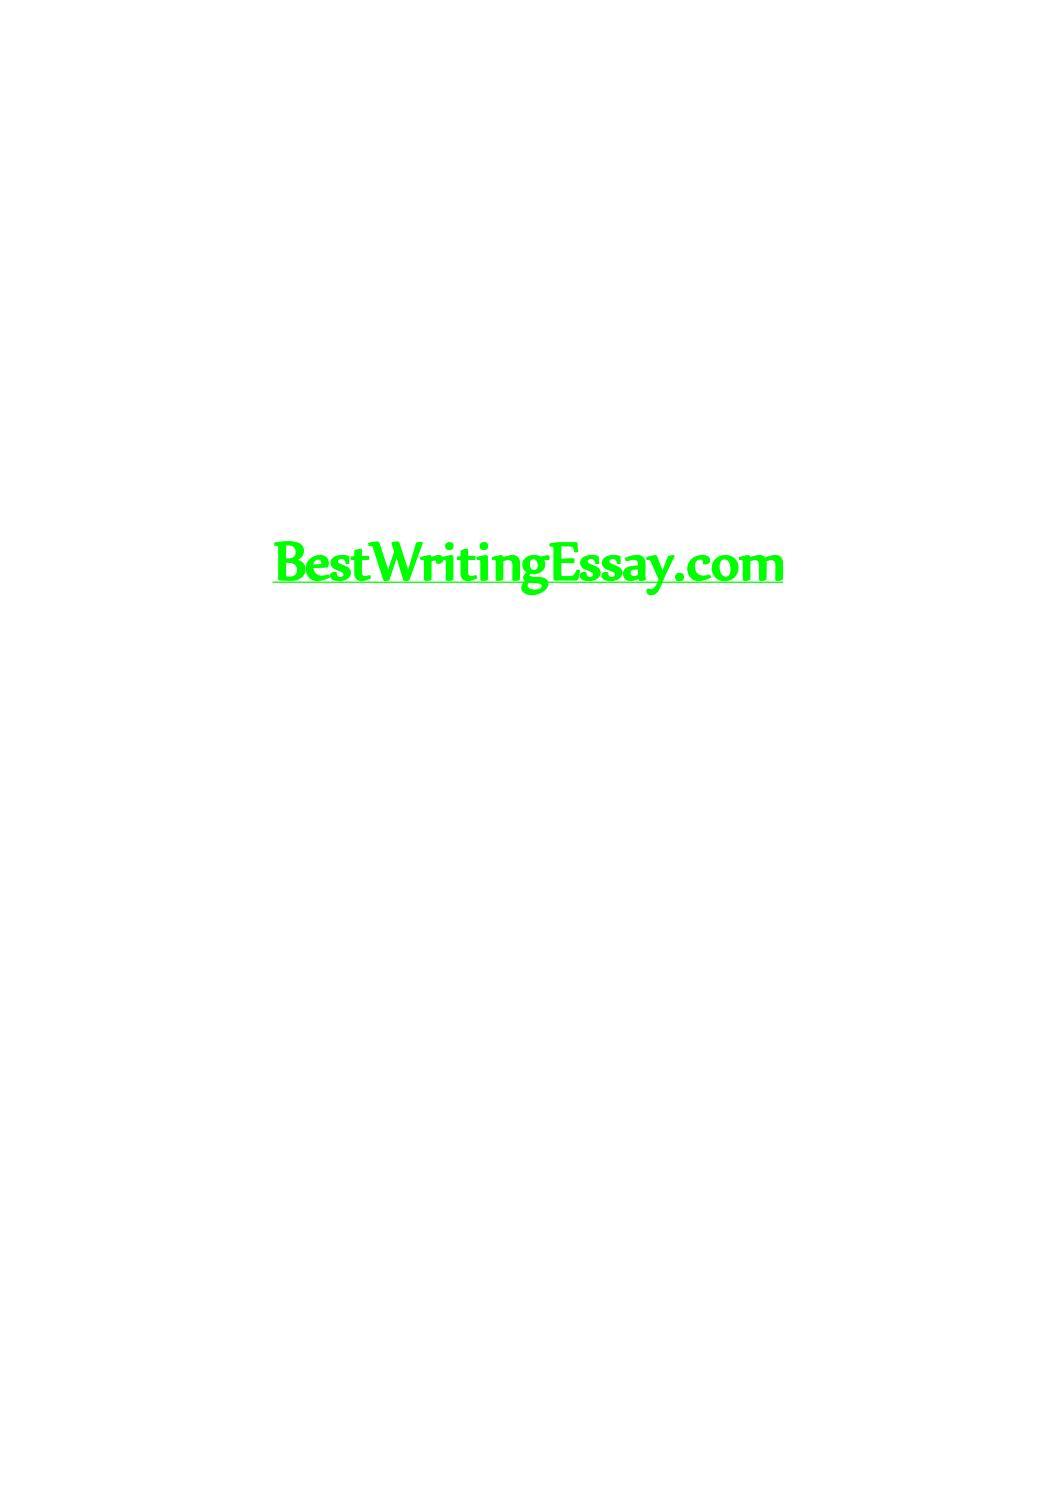 Cheap essay on economics